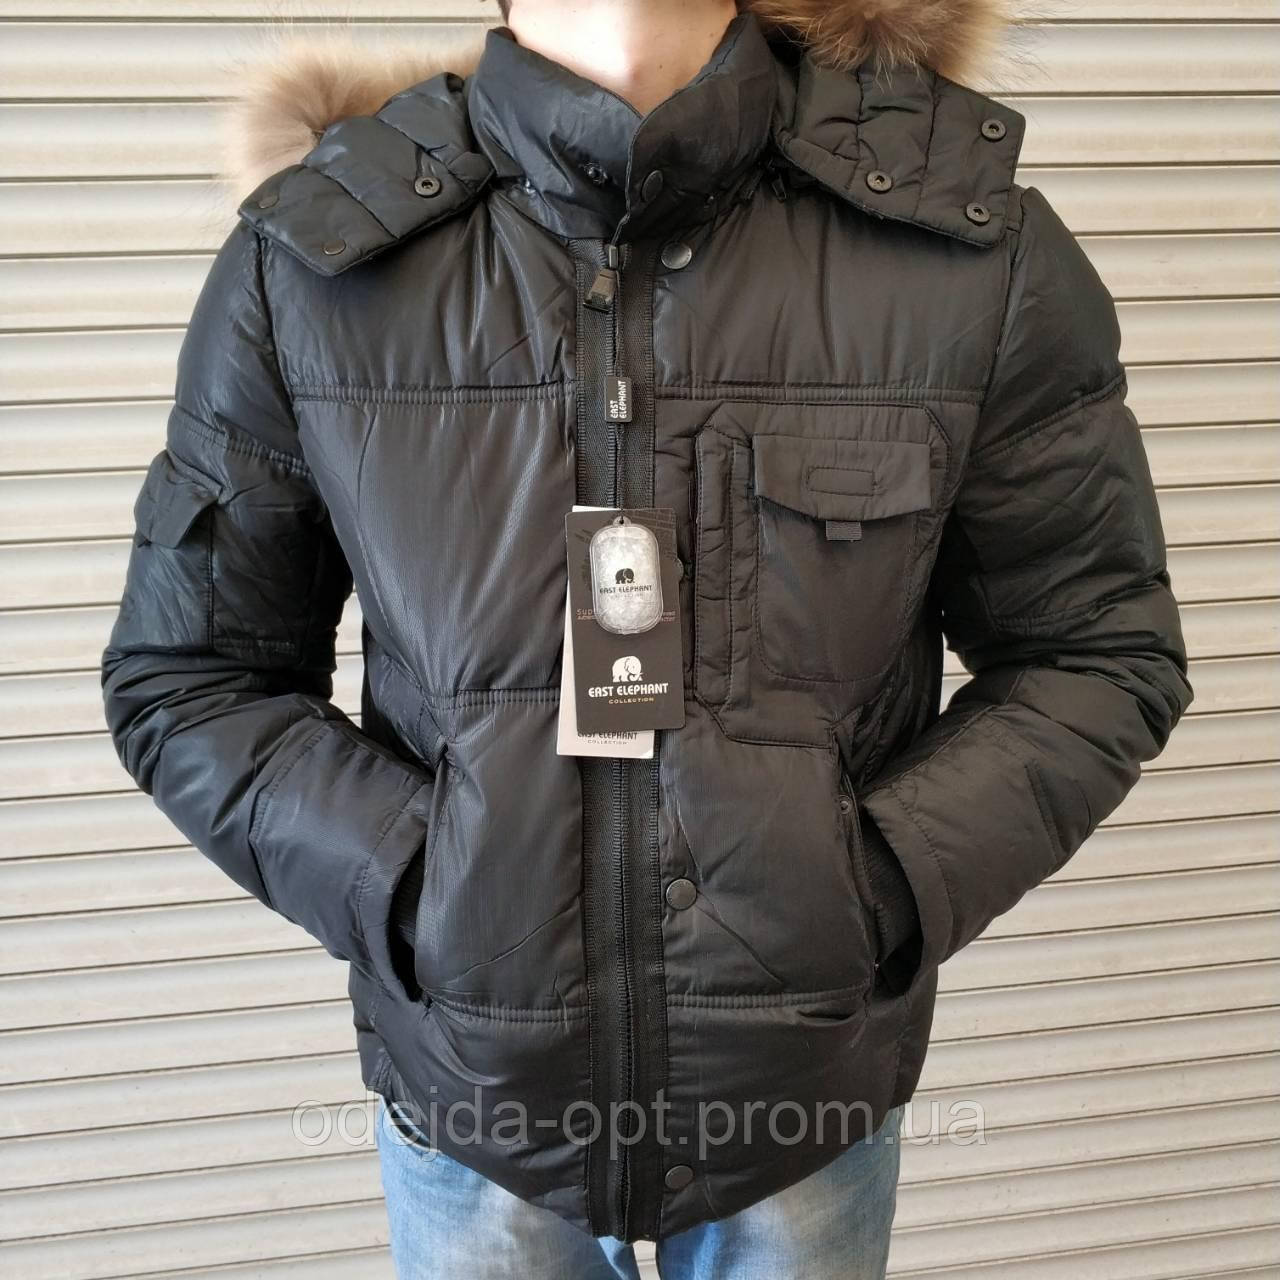 Куртка чоловіча зима-Пух 44-52р к-сть Обмежена